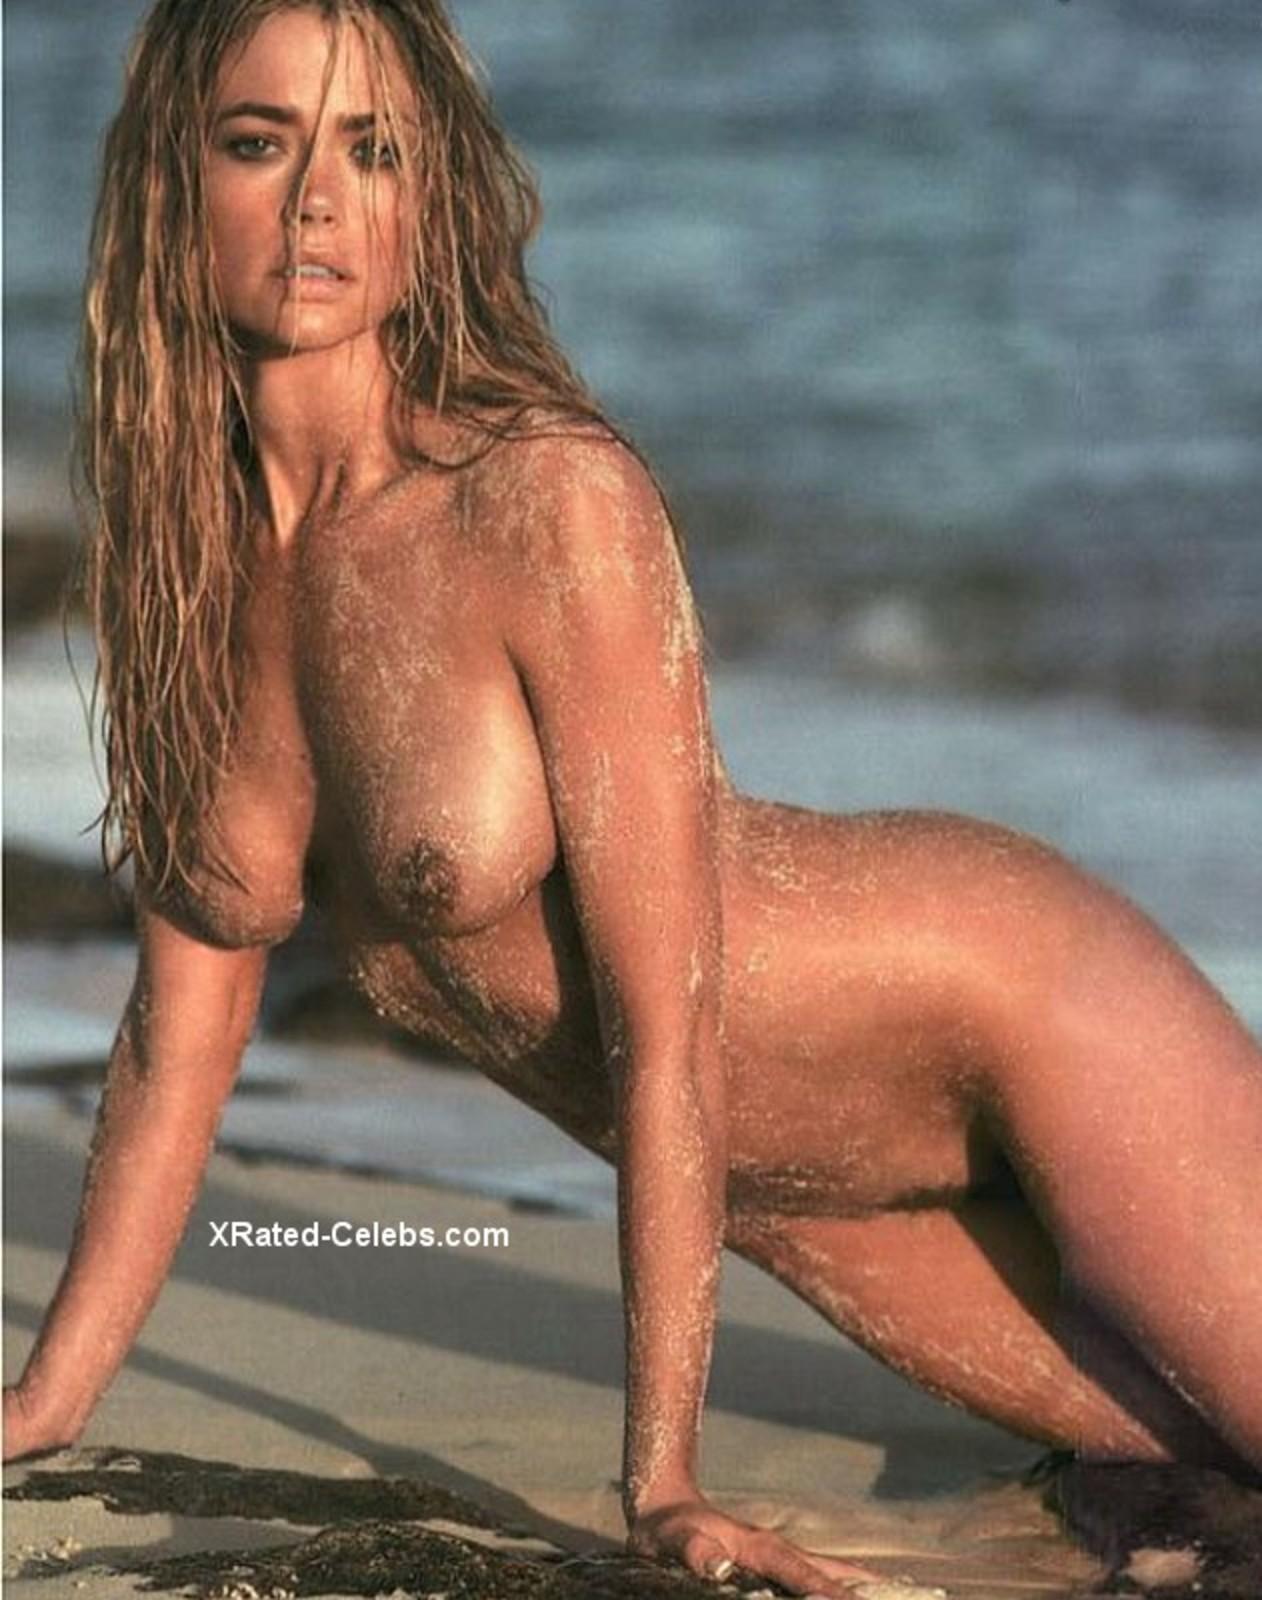 Giselle amp matt sexy amateur strips and sucks cock